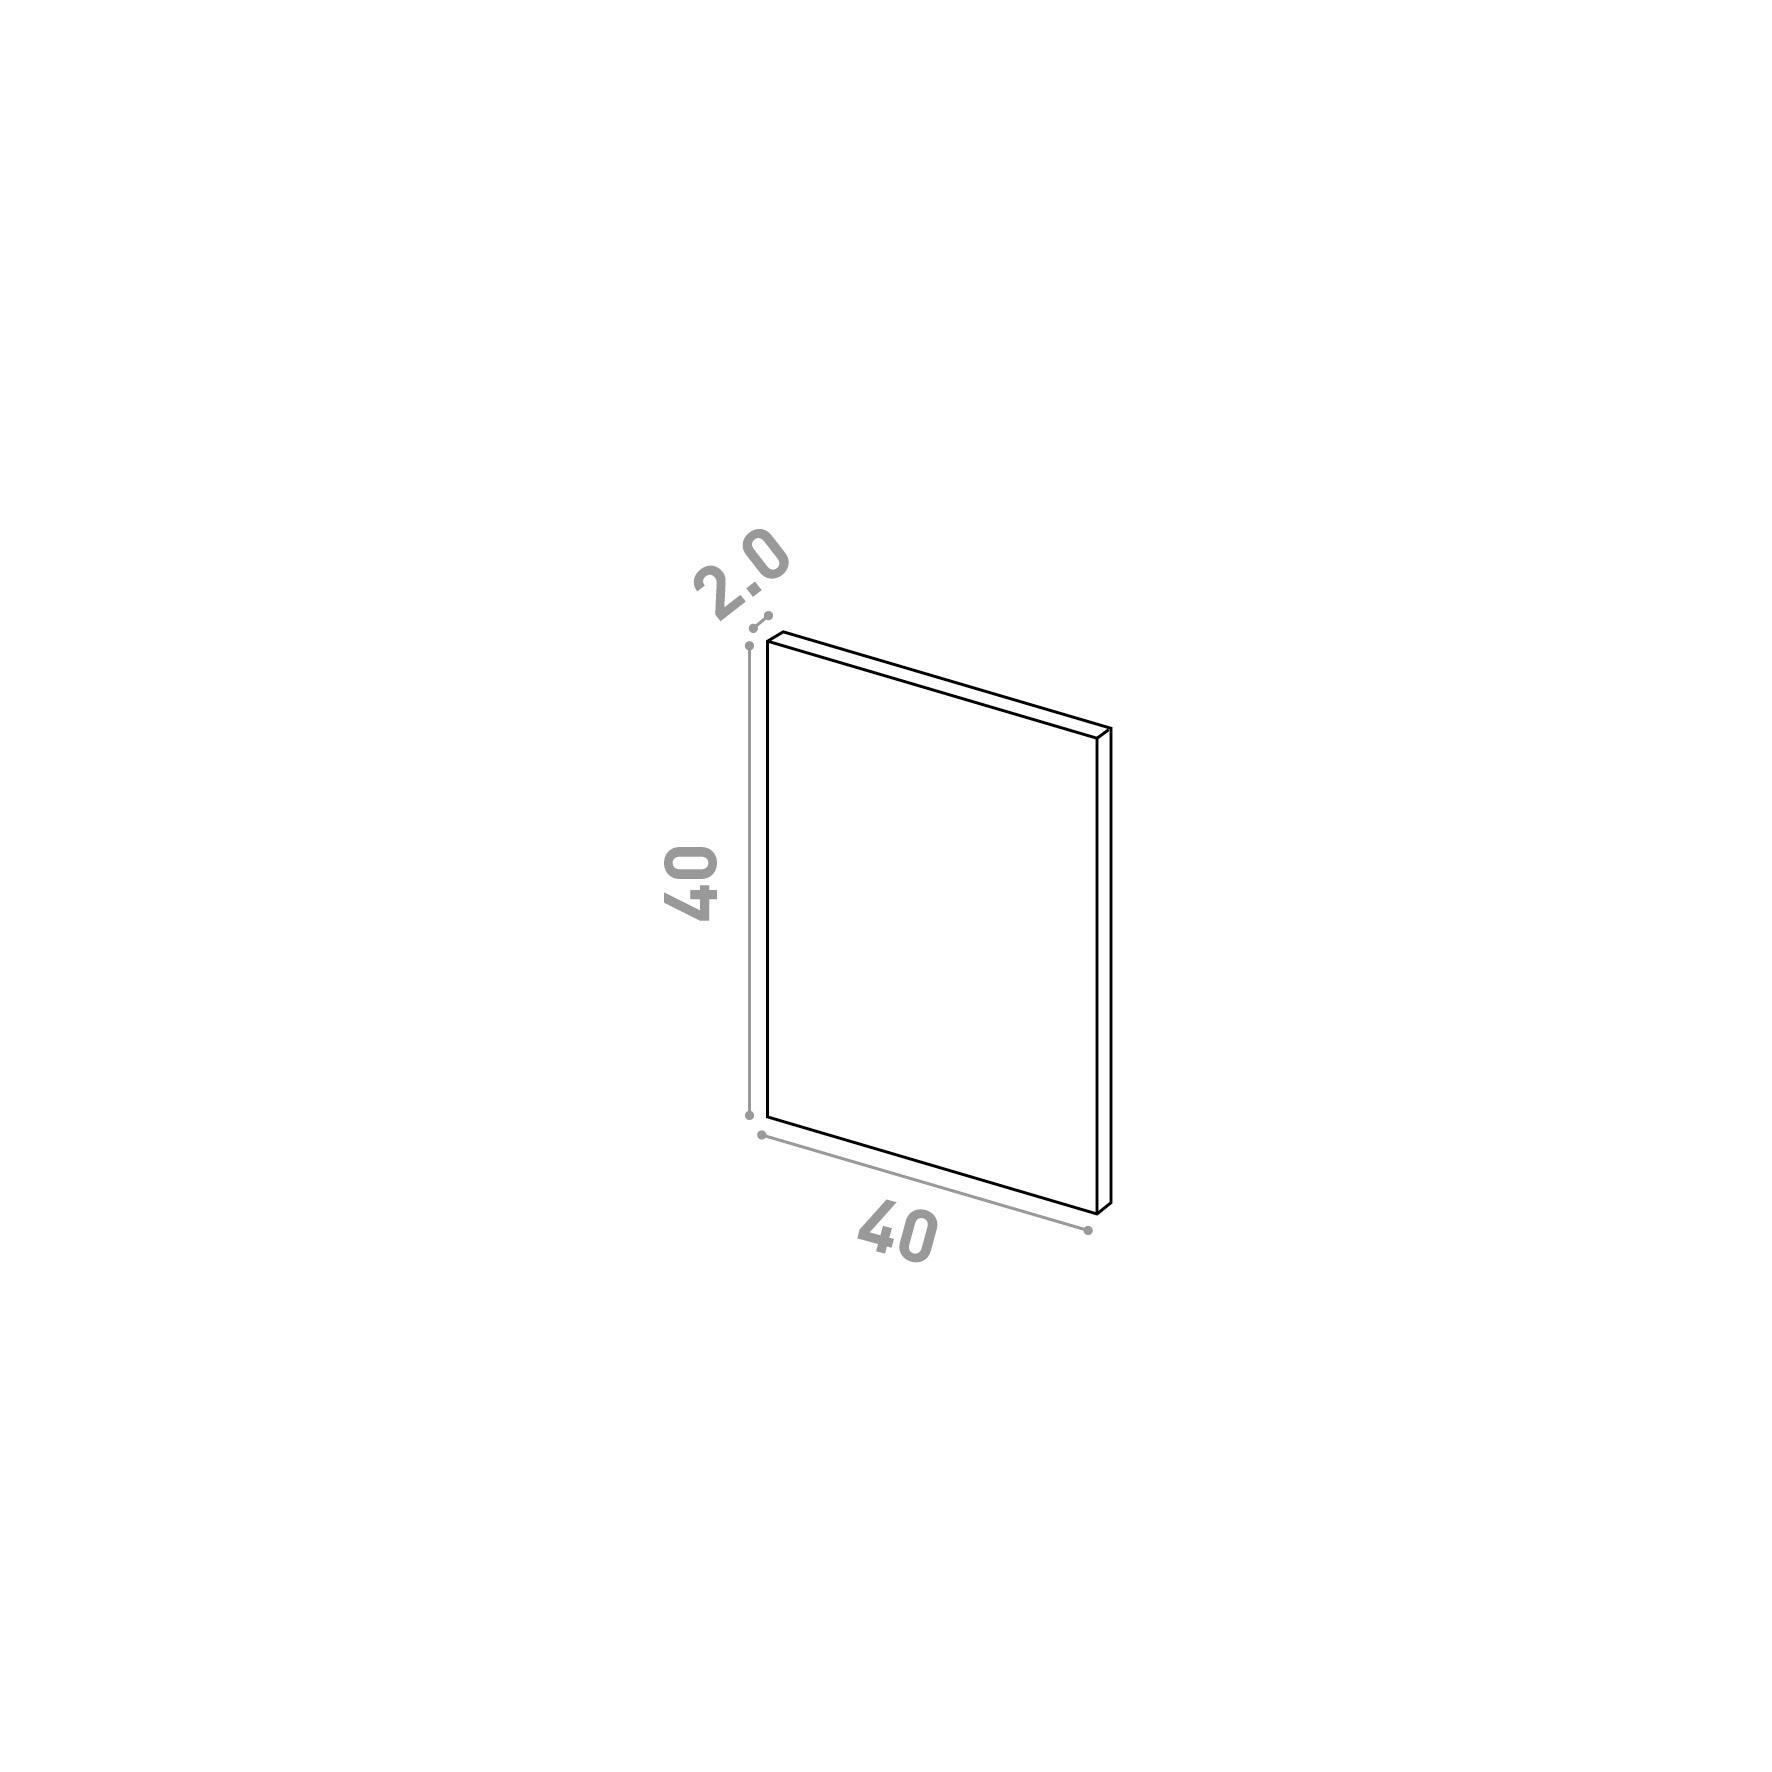 Porte 40X40cm   design lisse   chêne naturel